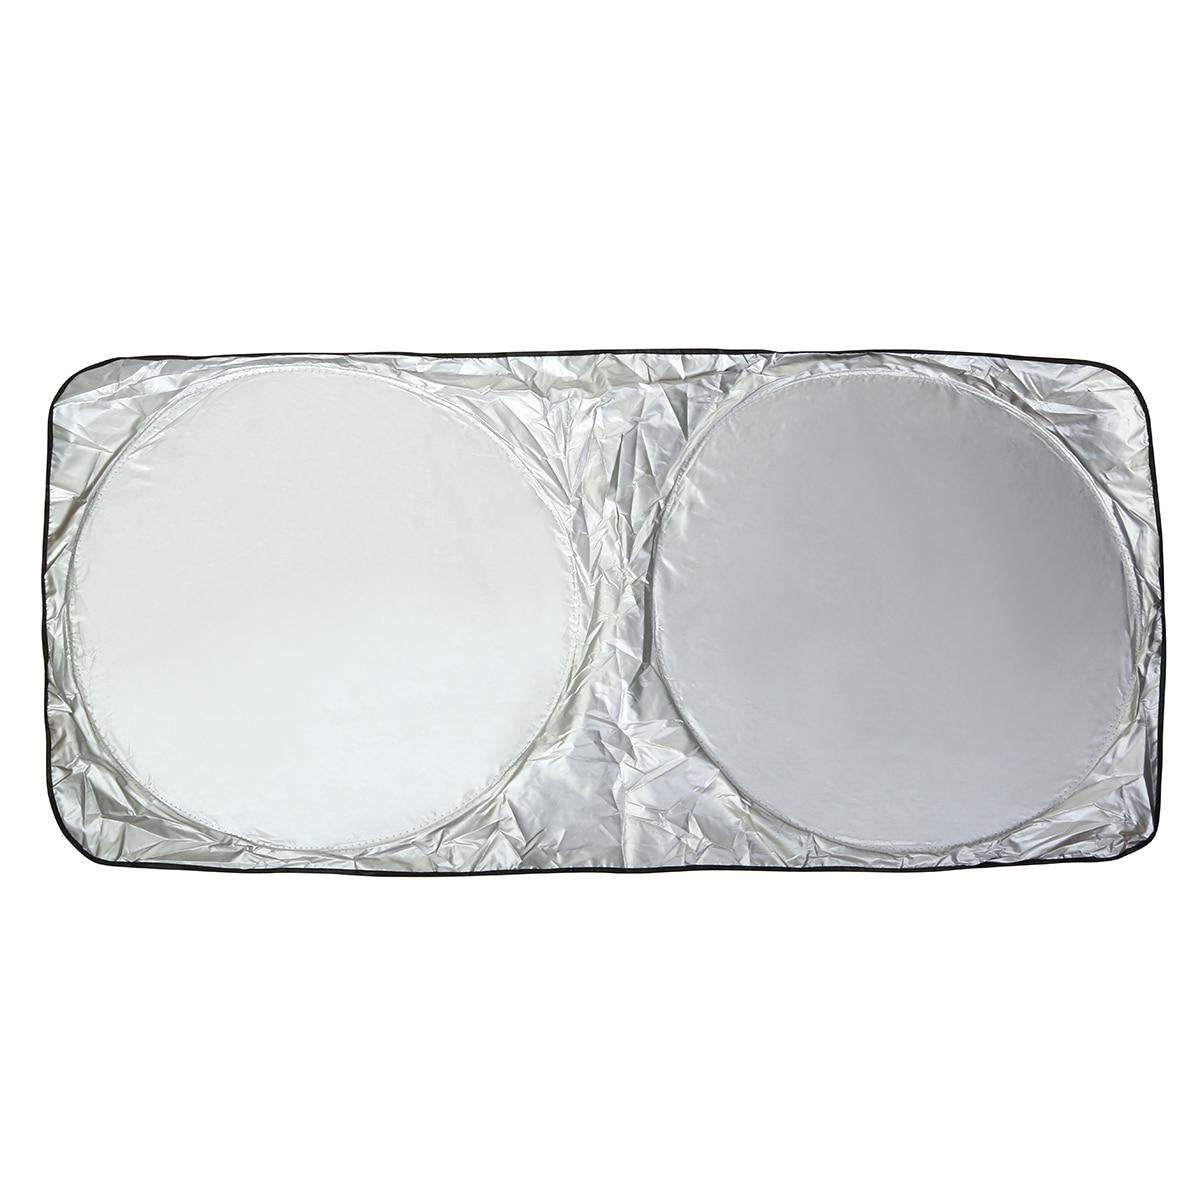 MAYITR Universal Foldable Sun Shade Car Front Rear Window Sunshade Auto Windshield Block Cover Visor Solar Protection Film